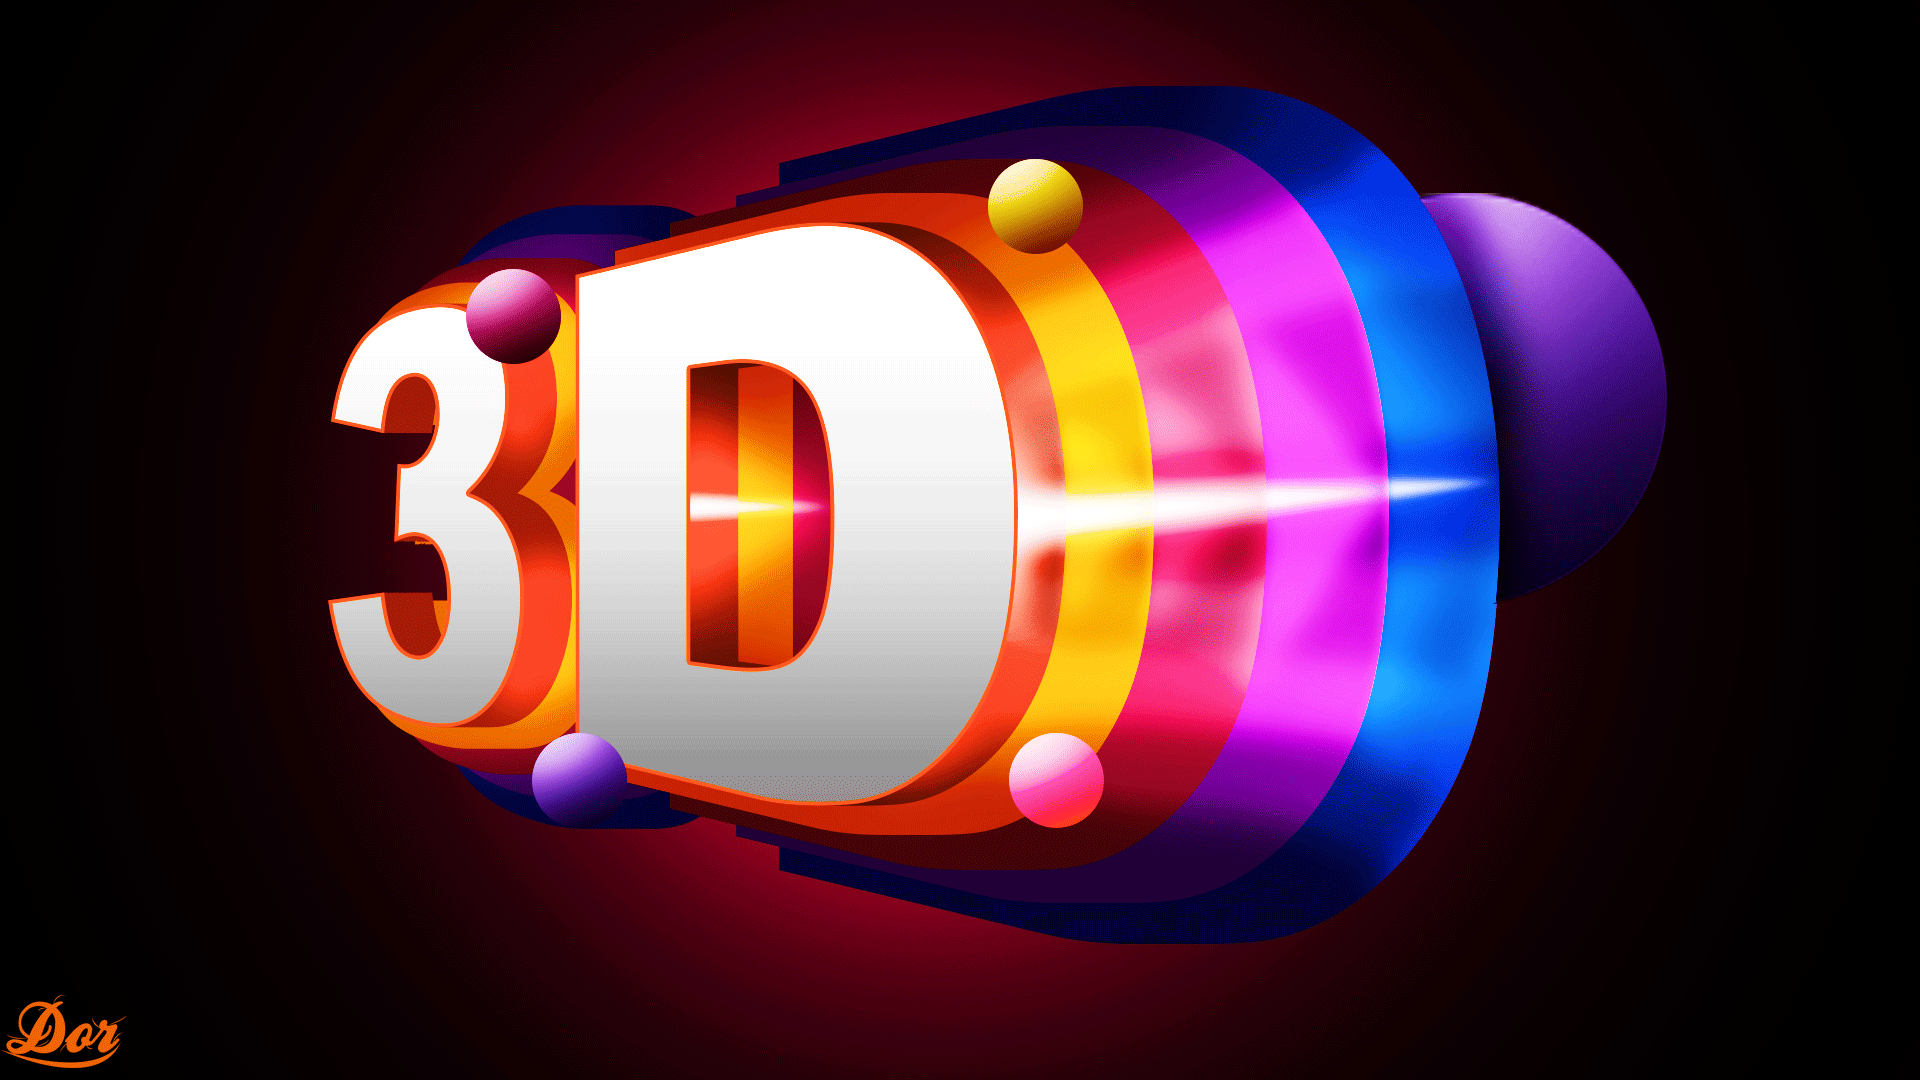 3d logo by dorgd on deviantart for Logo 3d online